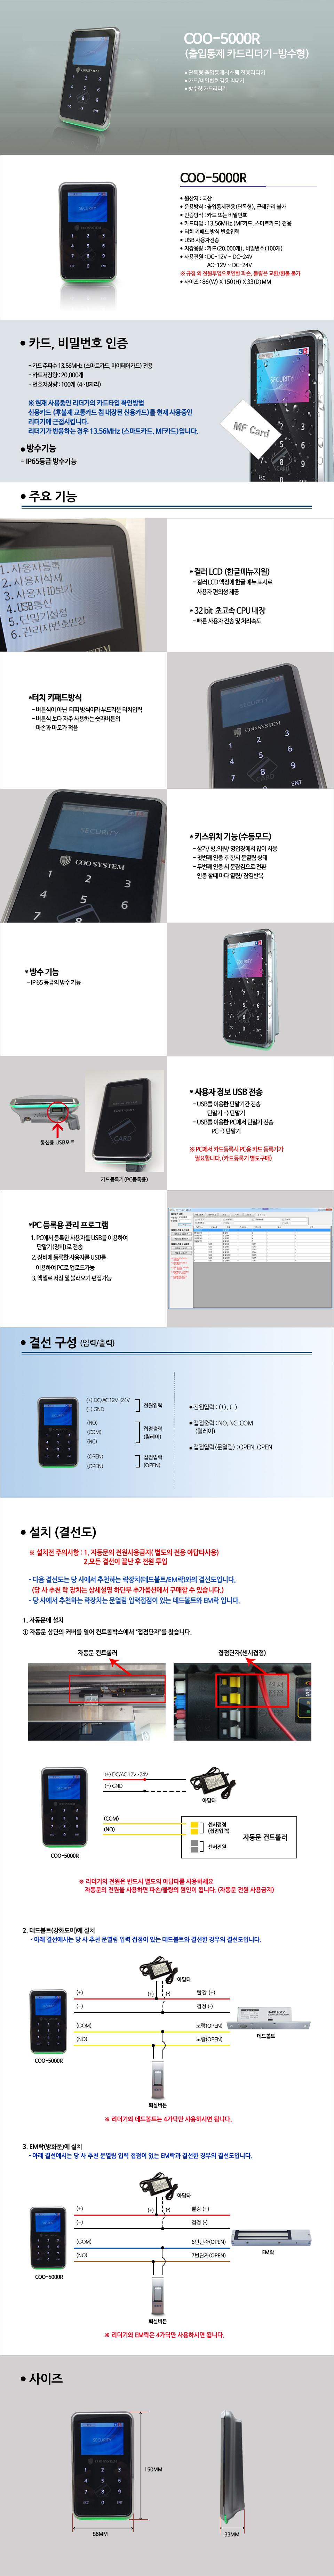 COO-5000R작업-COO도매.jpg